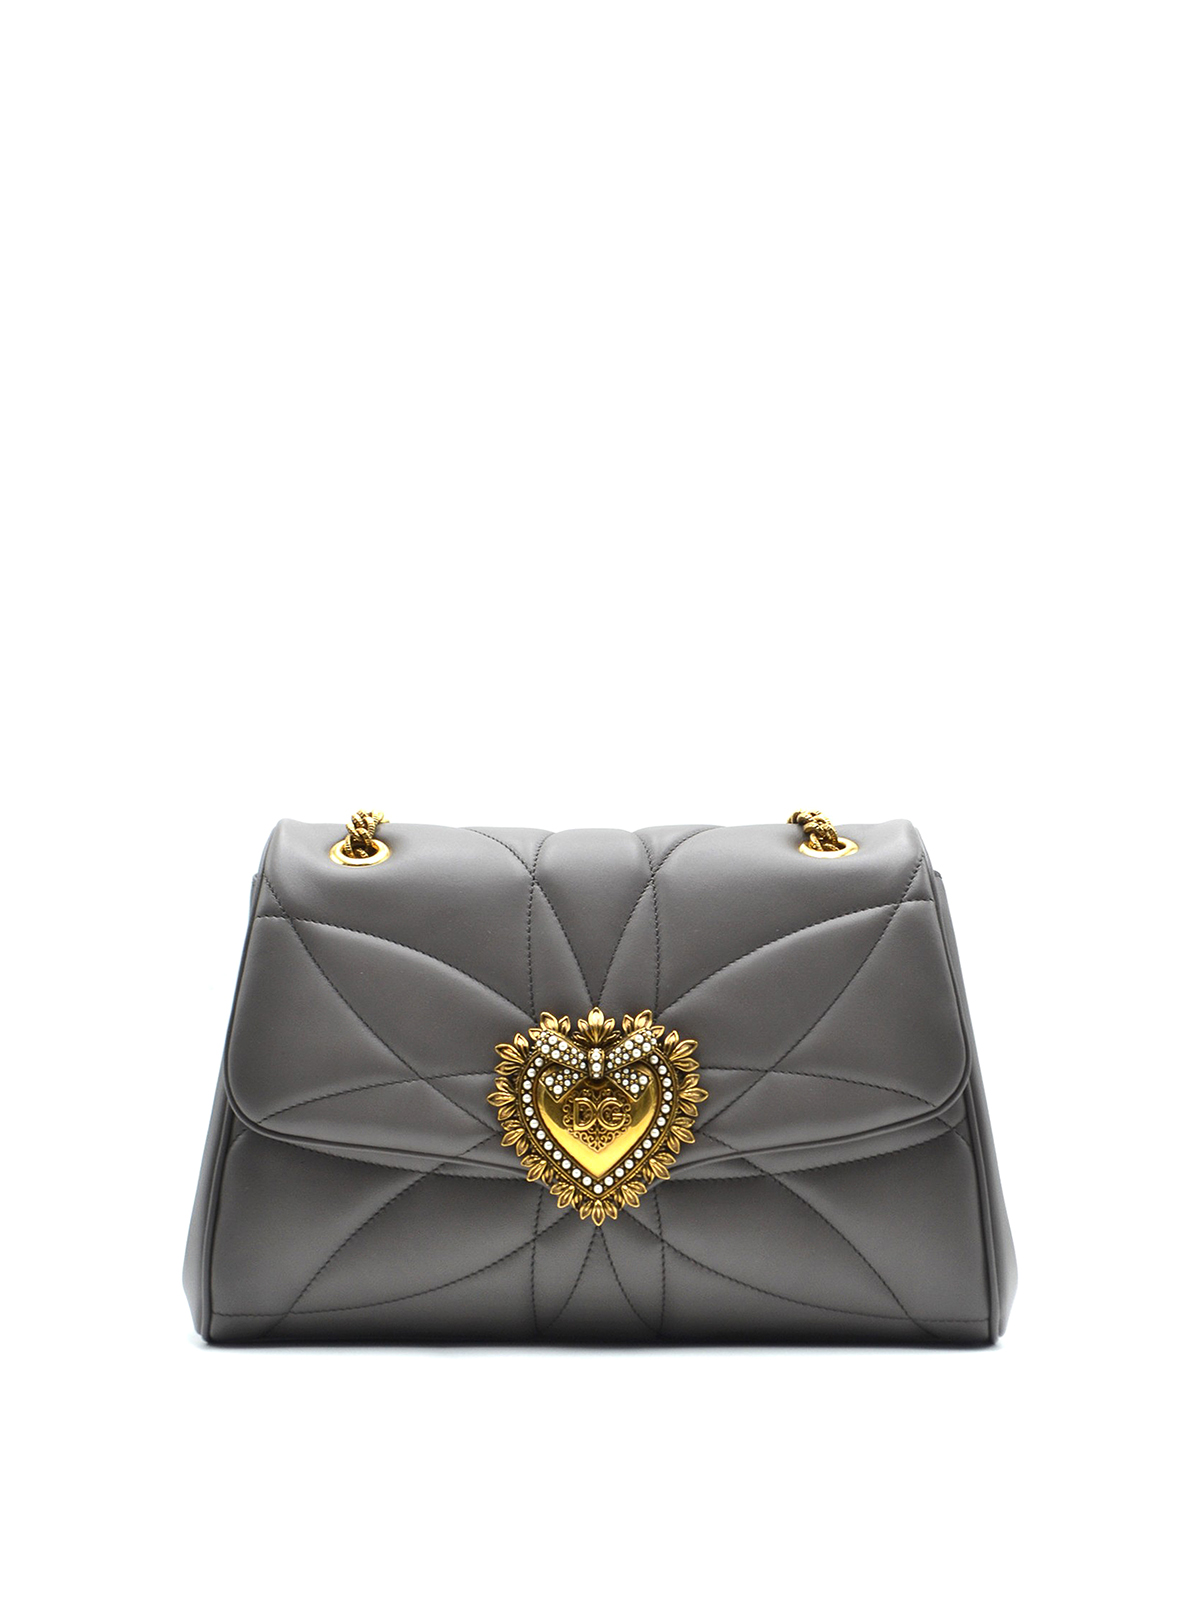 Dolce & Gabbana Devotion Grey Jewel Heart Bag